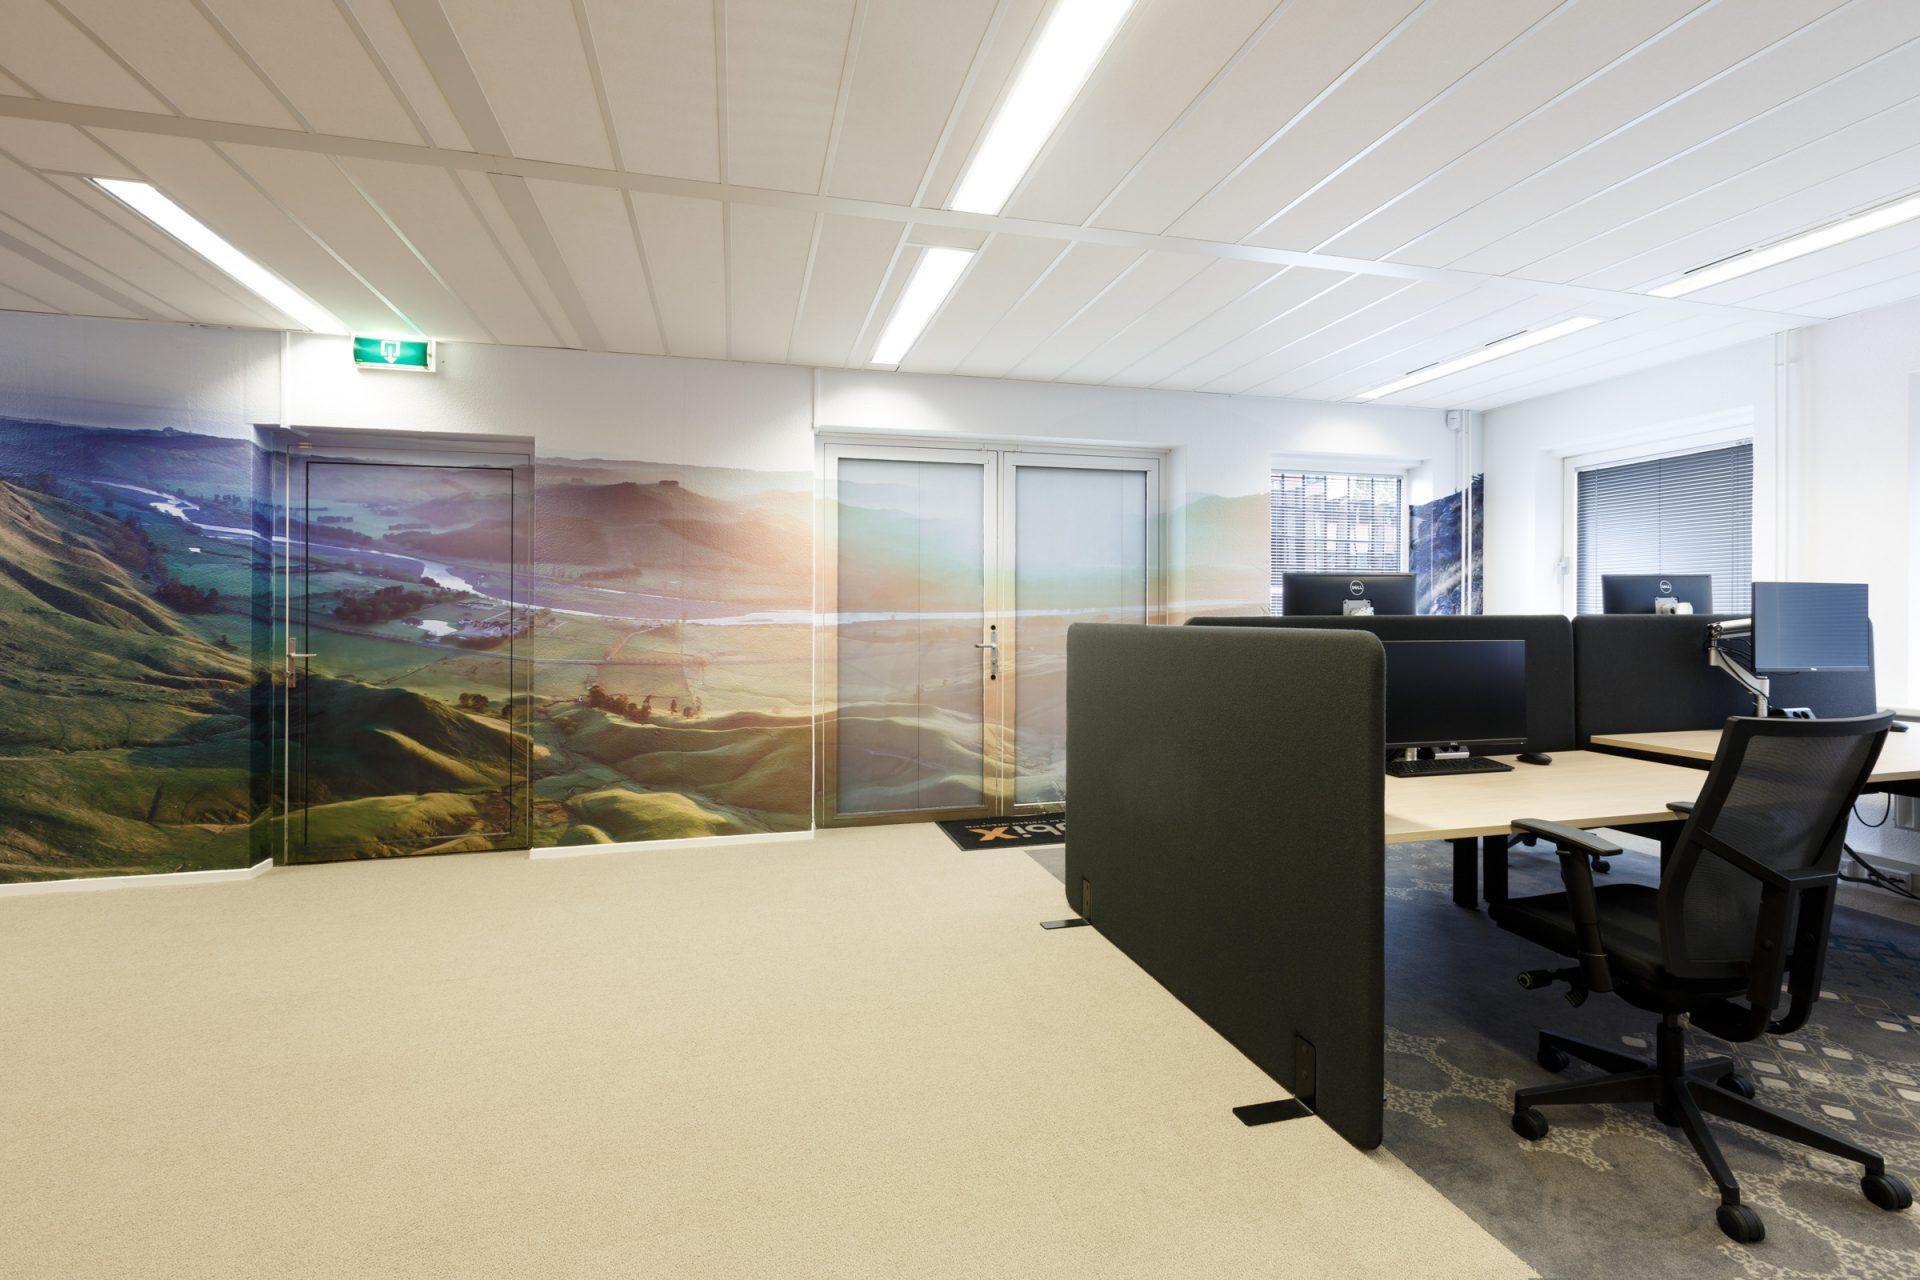 RubiX s-Hertogenbosch - Topperprojecten 5